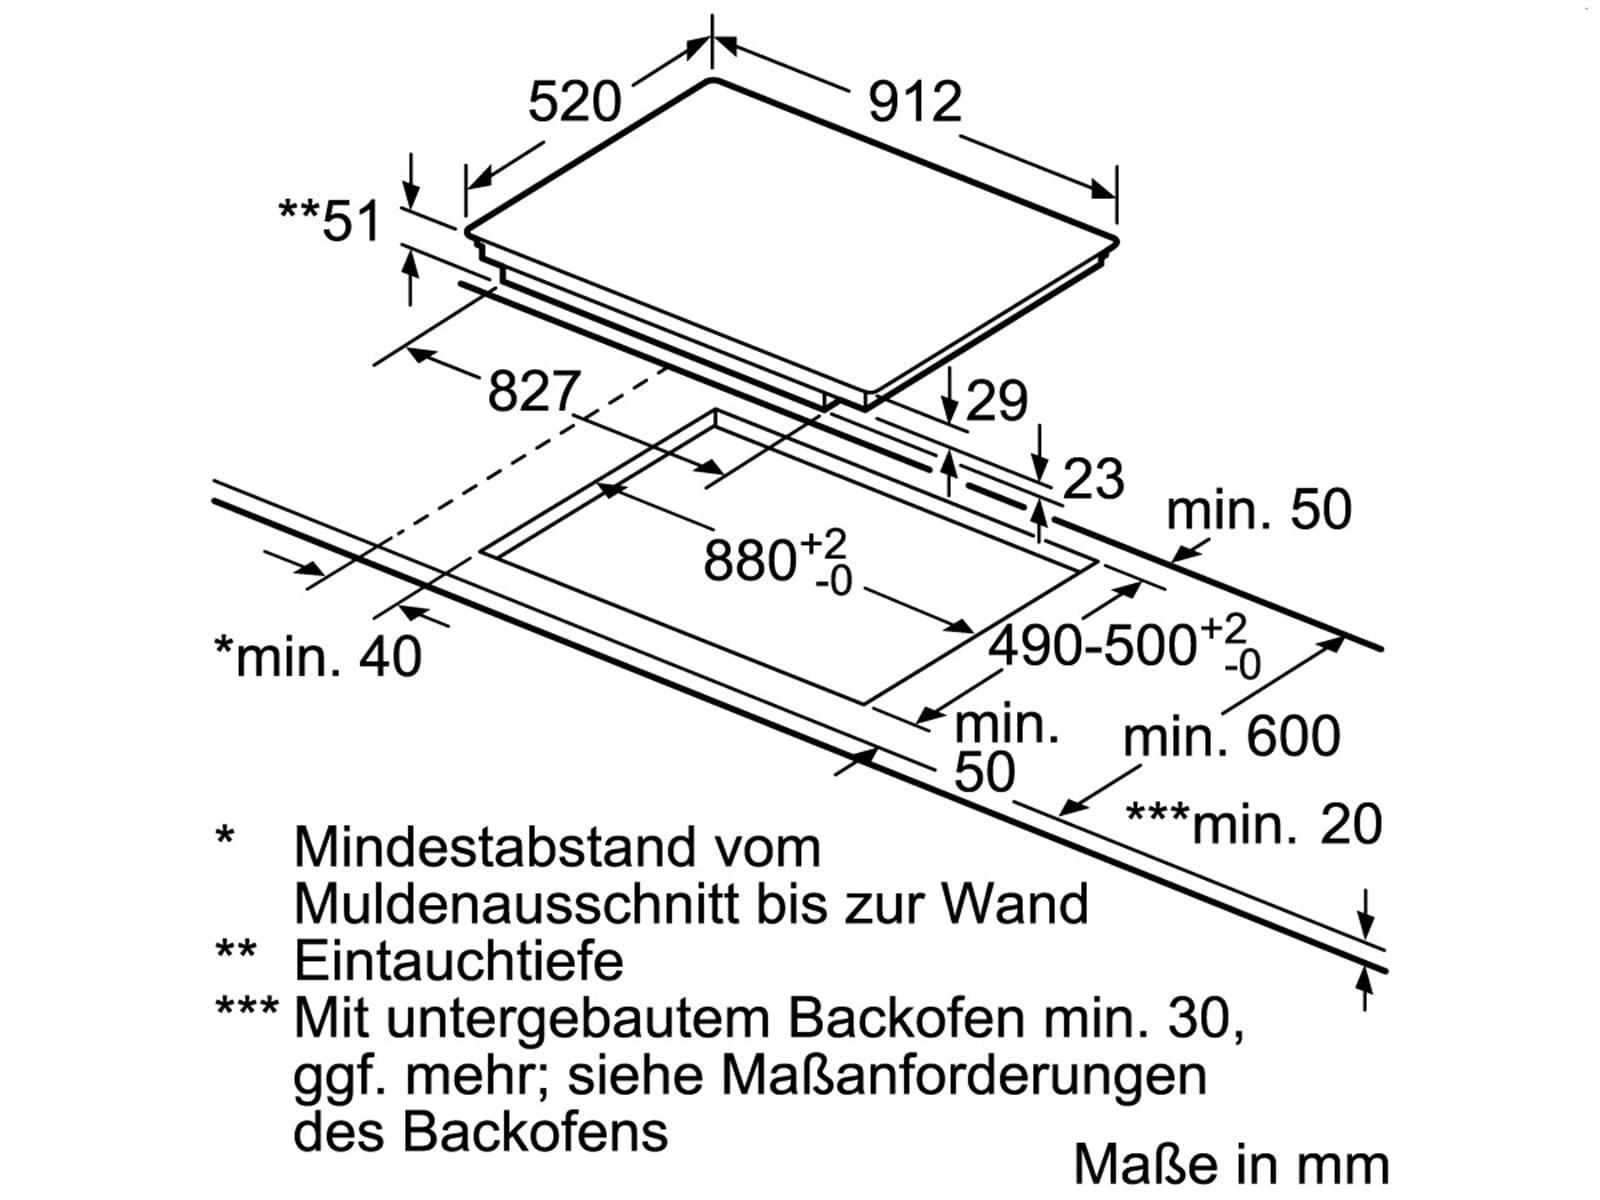 siemens eh975lvc1e induktionskochfeld autark. Black Bedroom Furniture Sets. Home Design Ideas